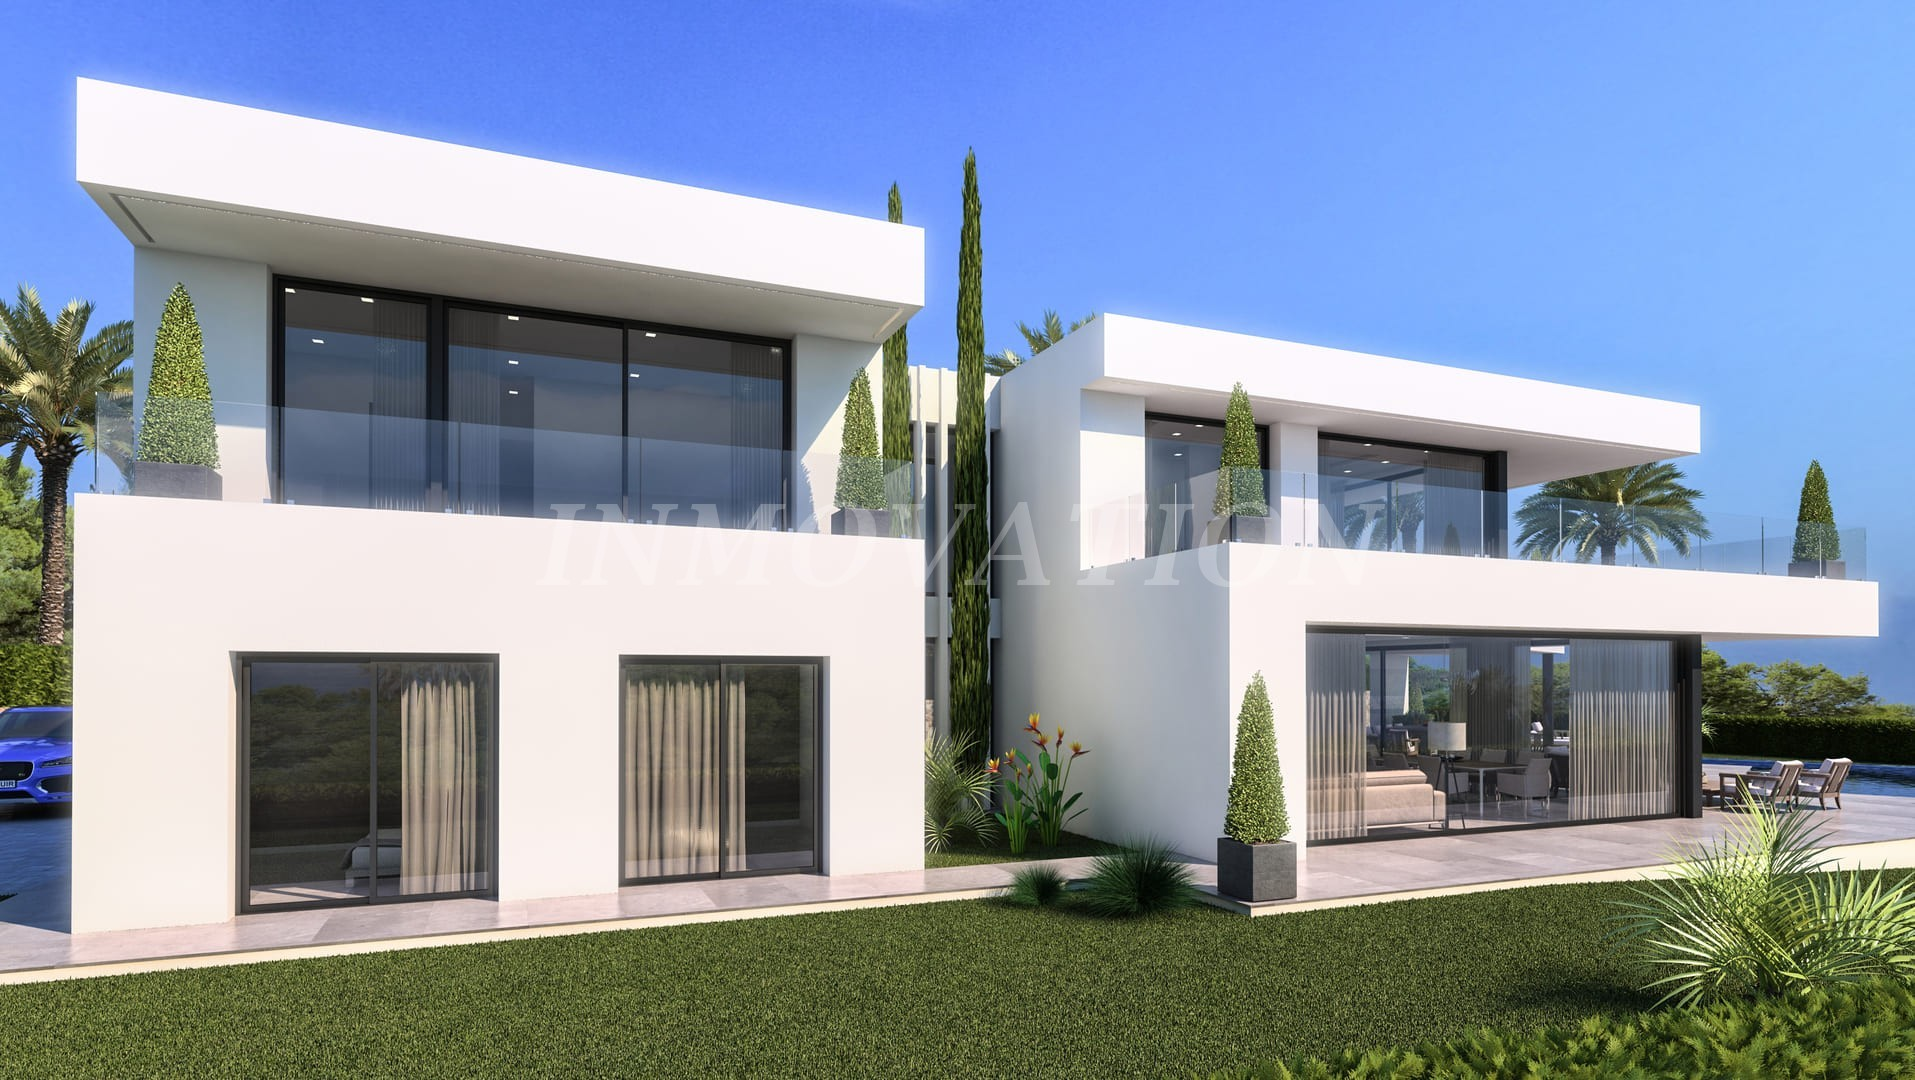 New Villa project in Javea, Costa Blanca, Spain